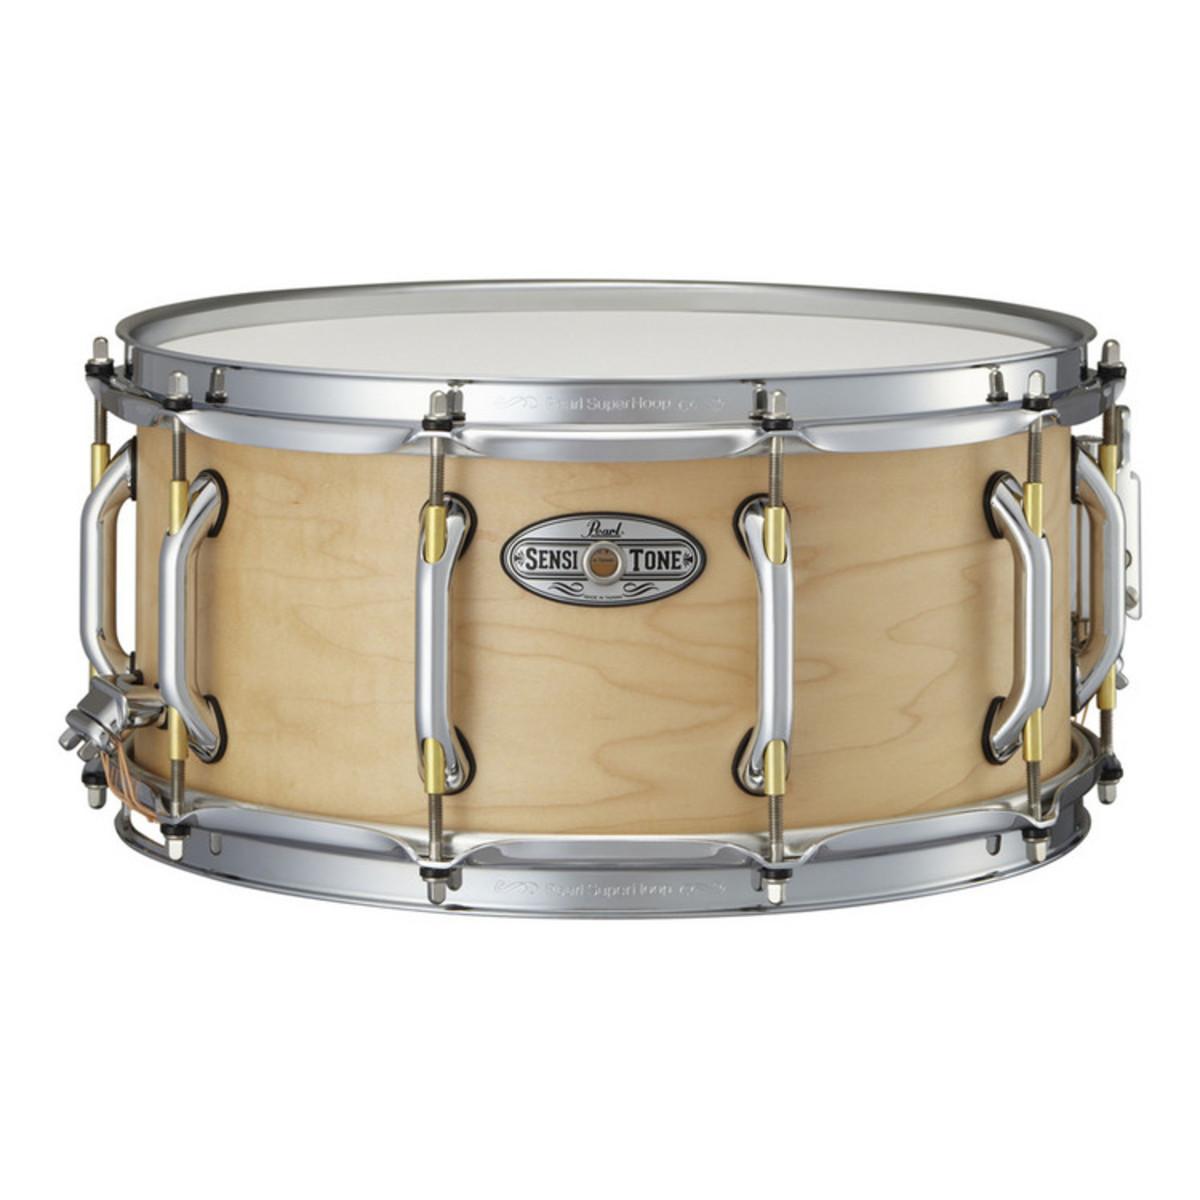 pearl sensitone premium 14 39 39 x 6 5 39 39 snare drum maple at gear4music. Black Bedroom Furniture Sets. Home Design Ideas